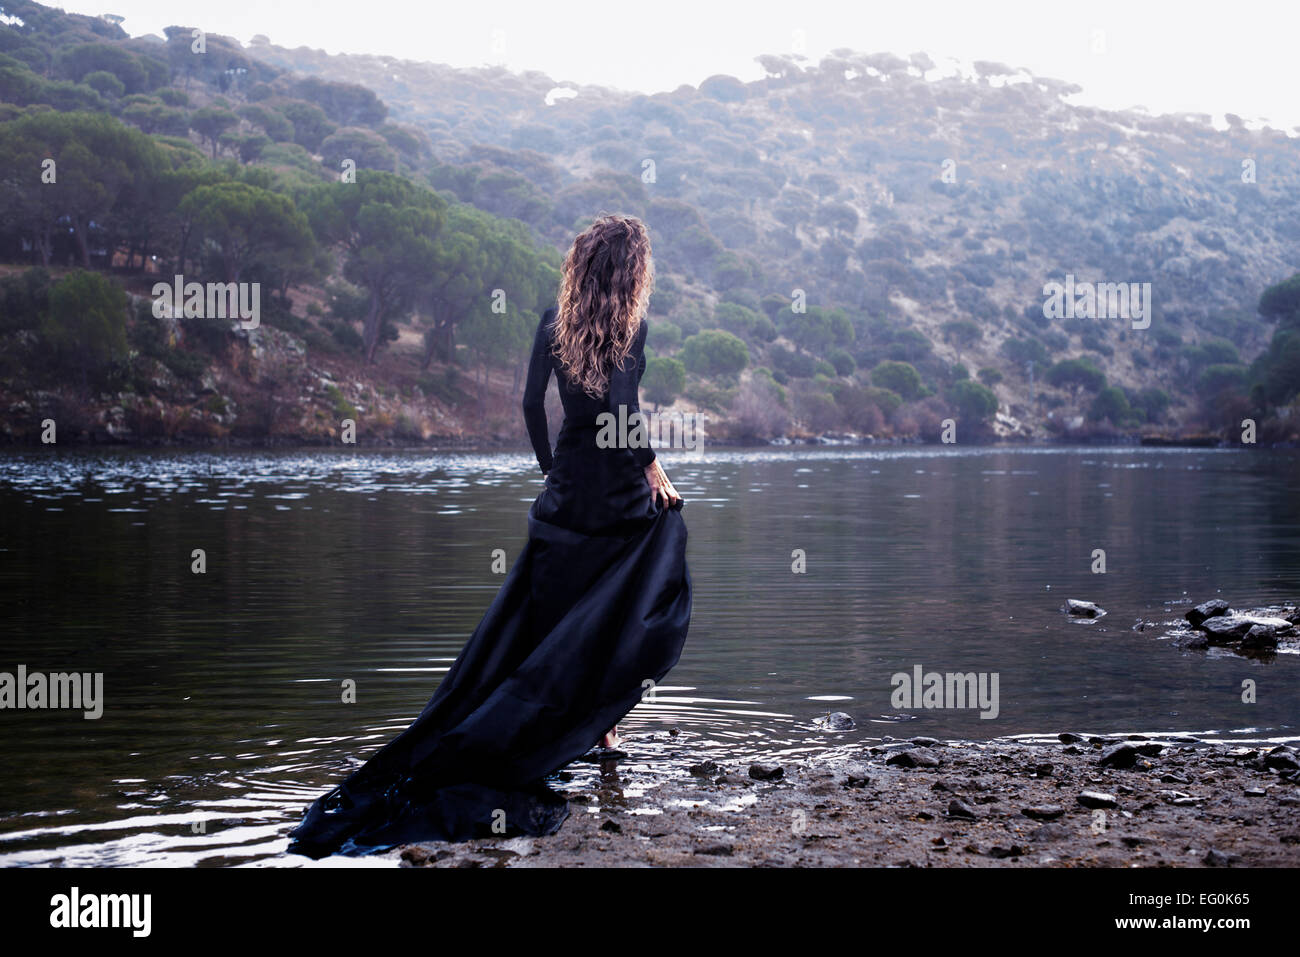 Woman in black dress walking into water - Stock Image